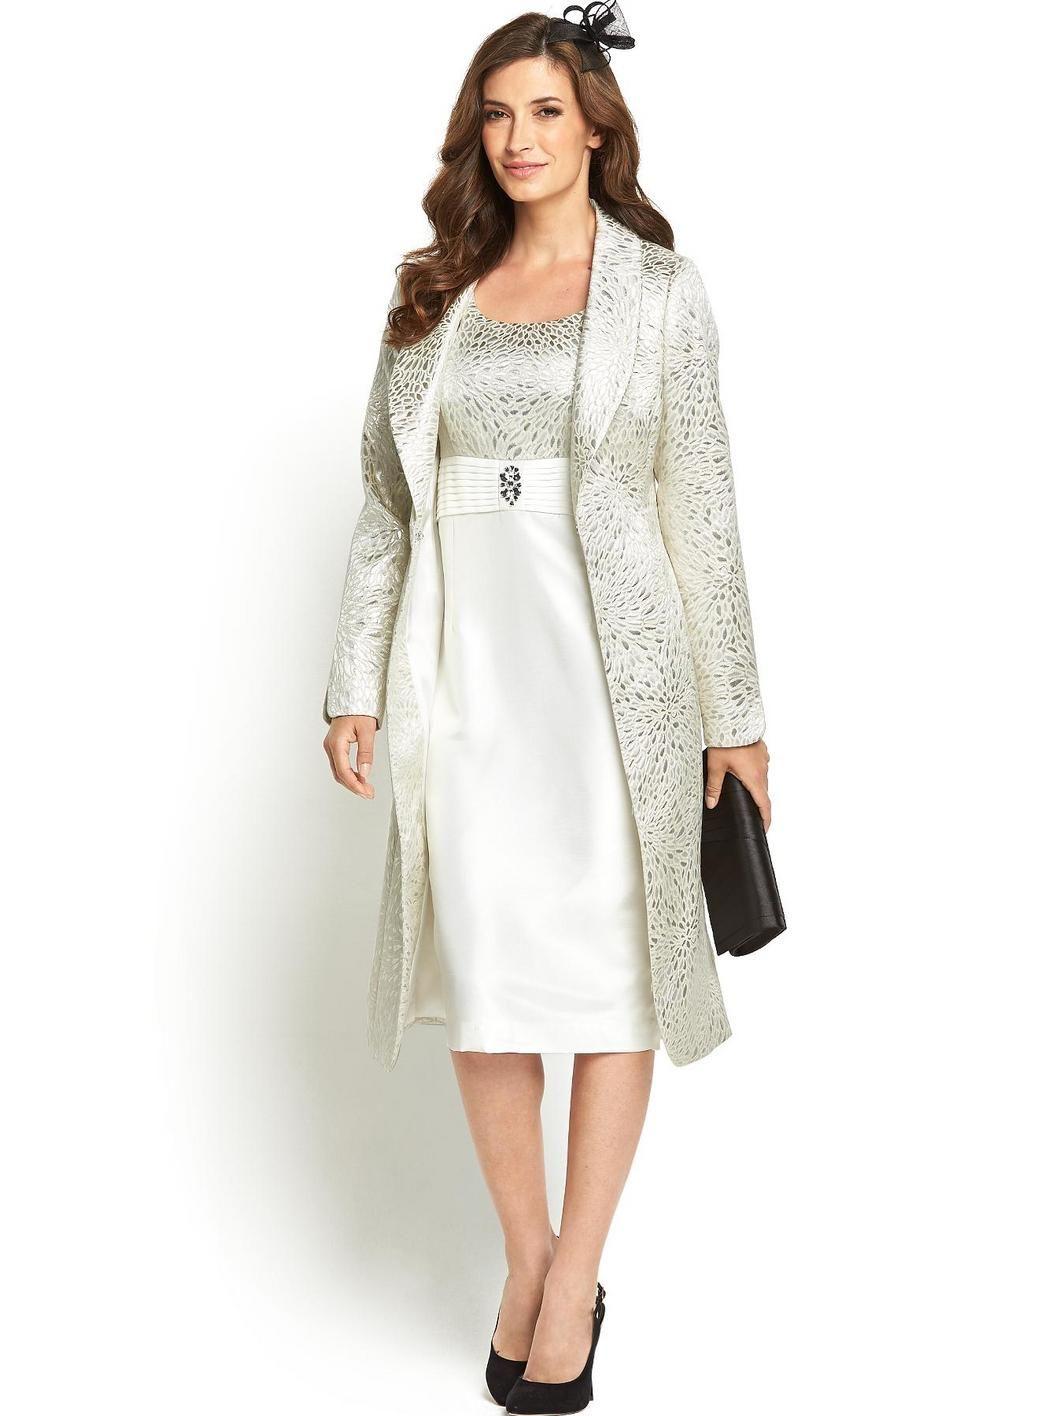 Jacquard Dress and Coat Suit, http://www.isme.com/berkertex-jacquard ...